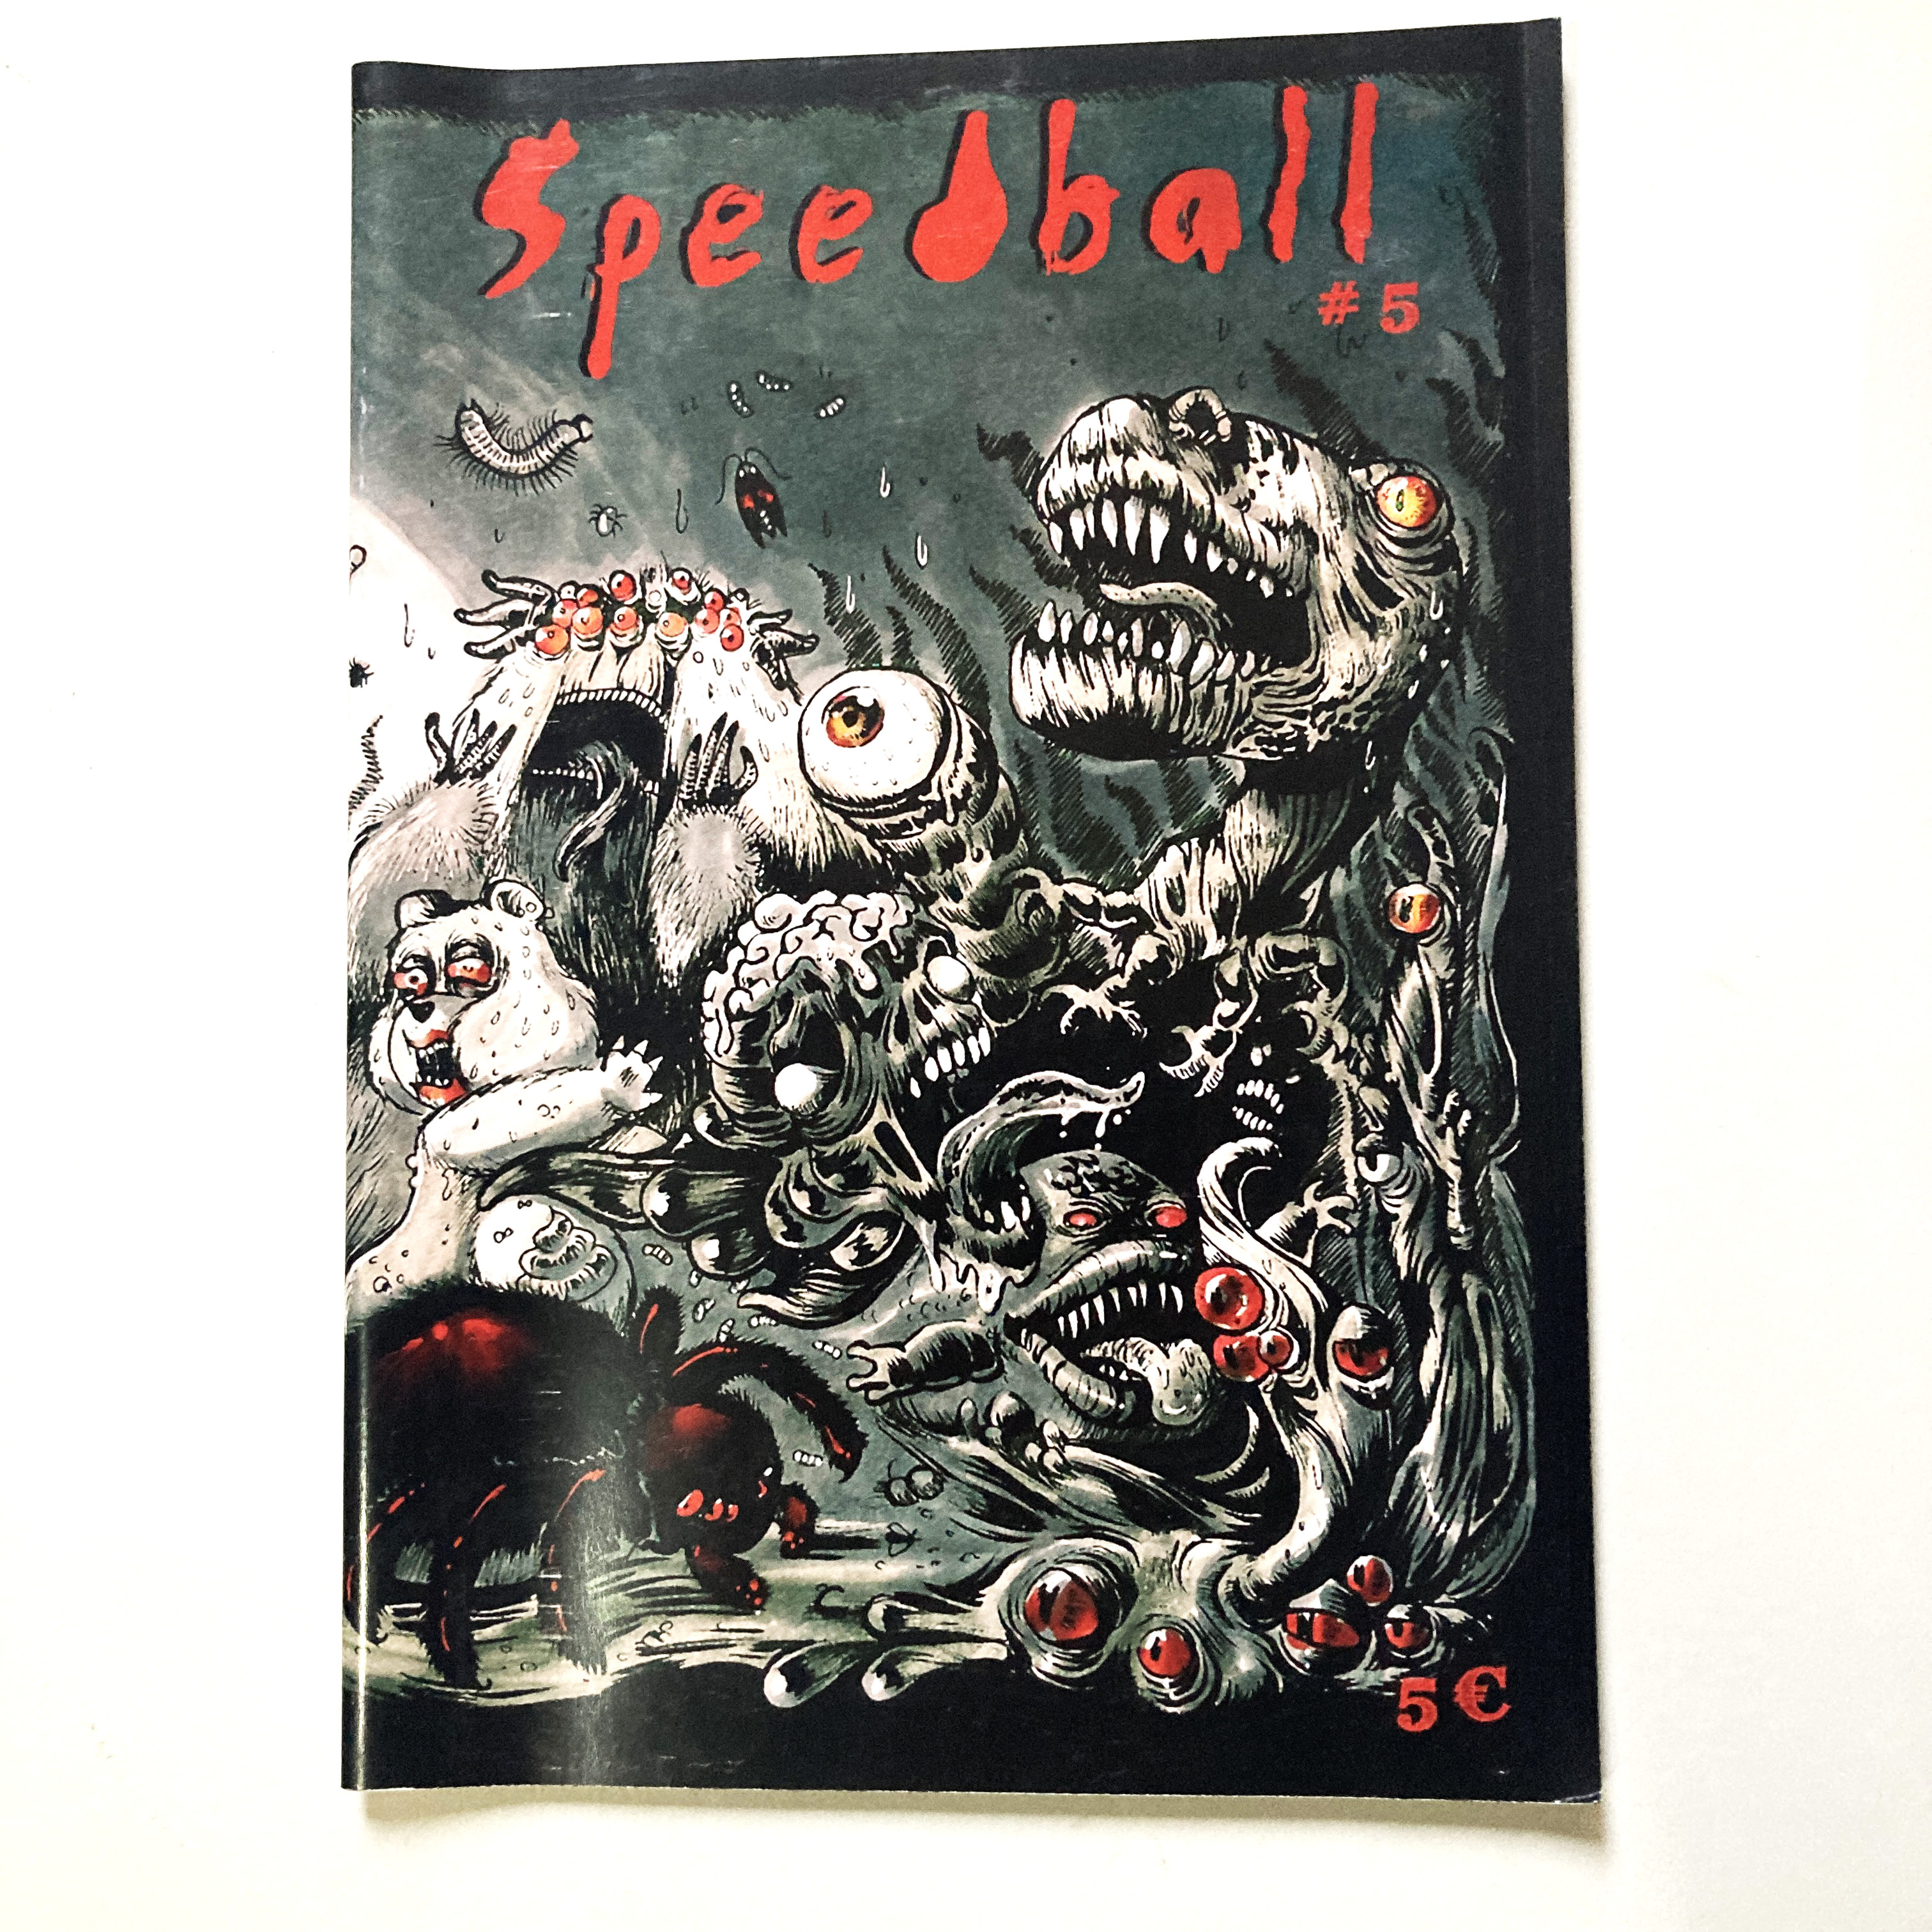 Speedball #5 - punk & phobies